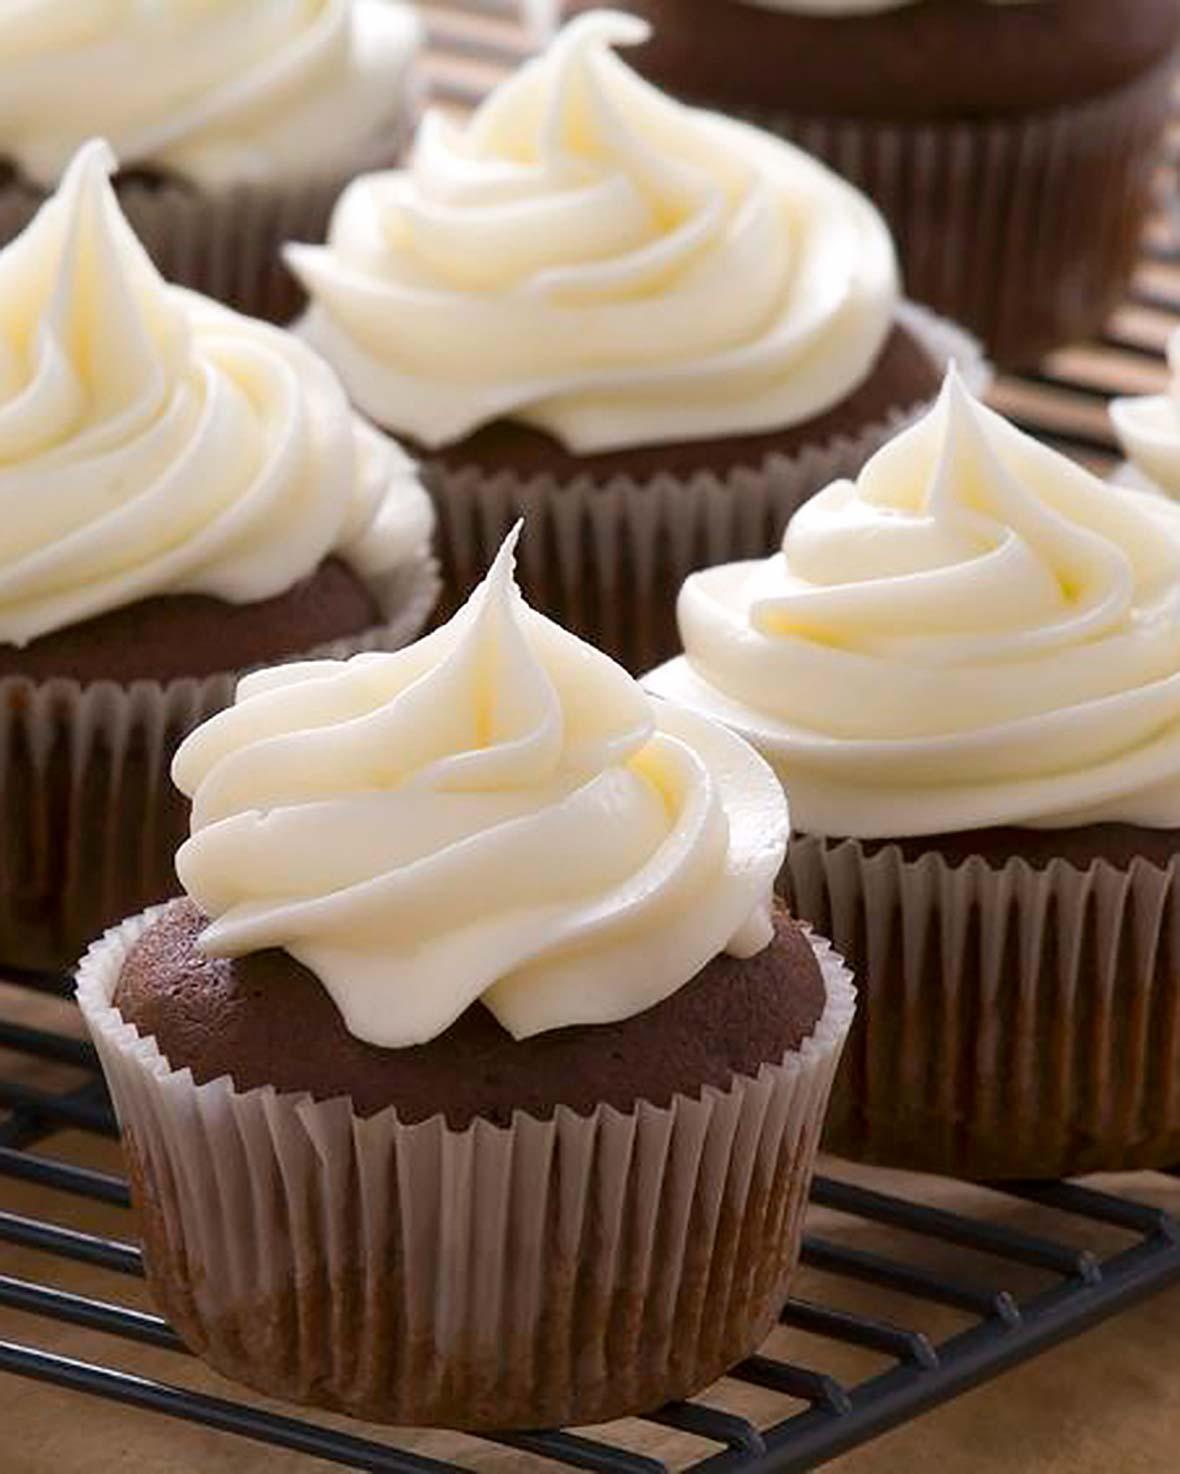 Espresso Cupcakes, Ganache, White Chocolate Frosting